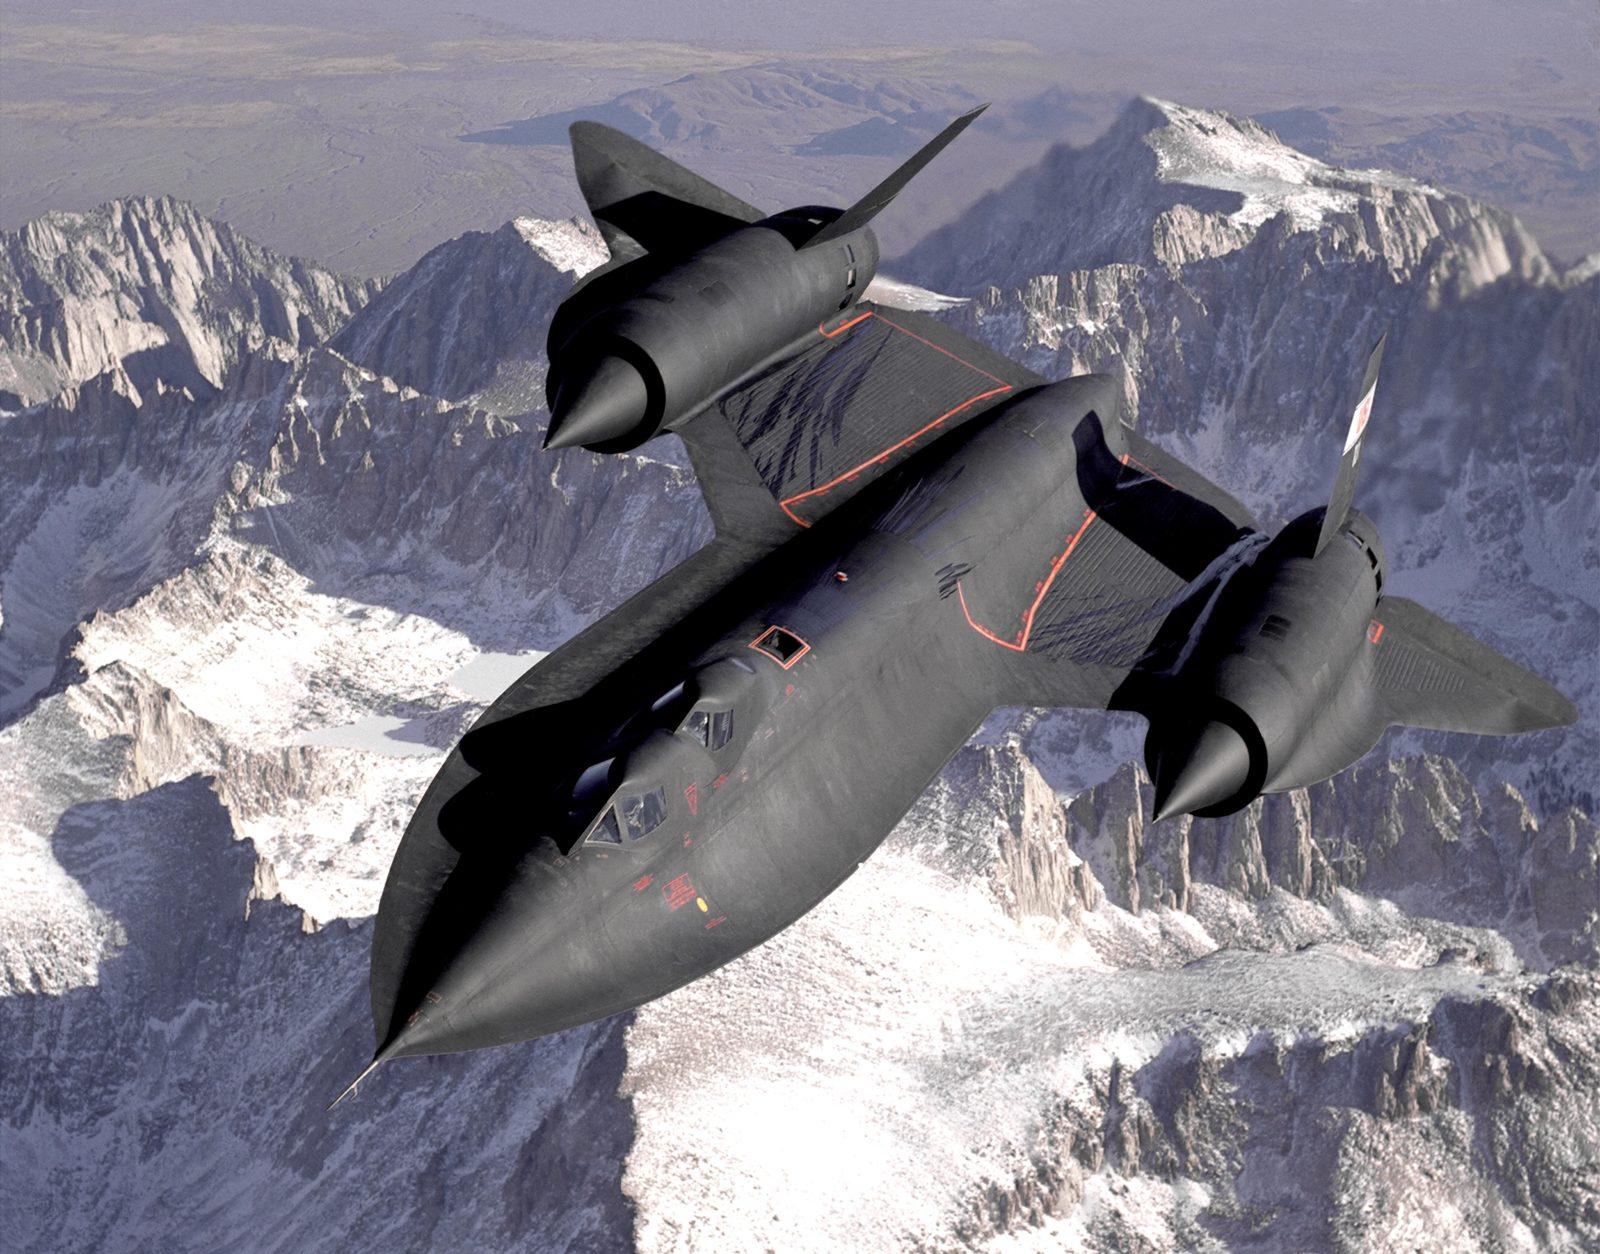 Lockheed SR-71B